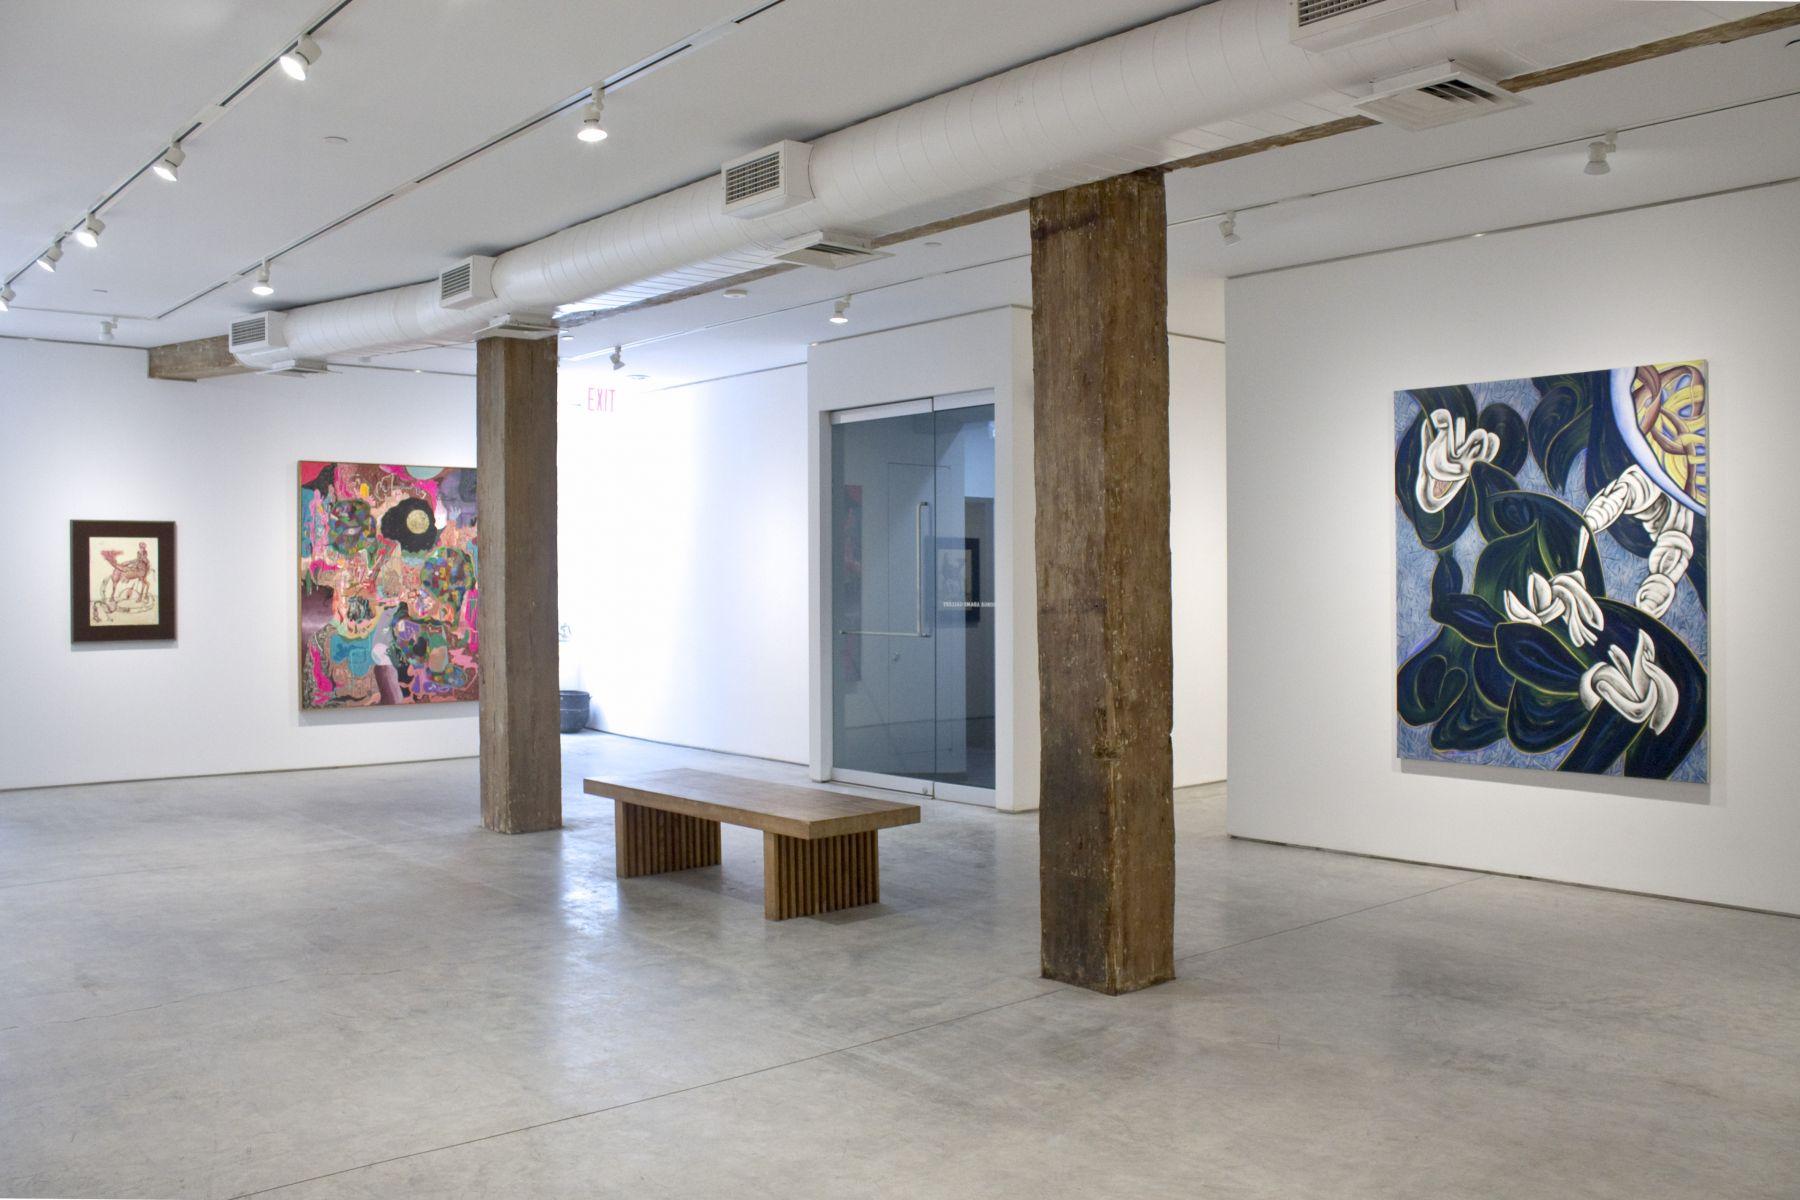 Installation View, Body/Object, George Adams Gallery, New York, 2019.